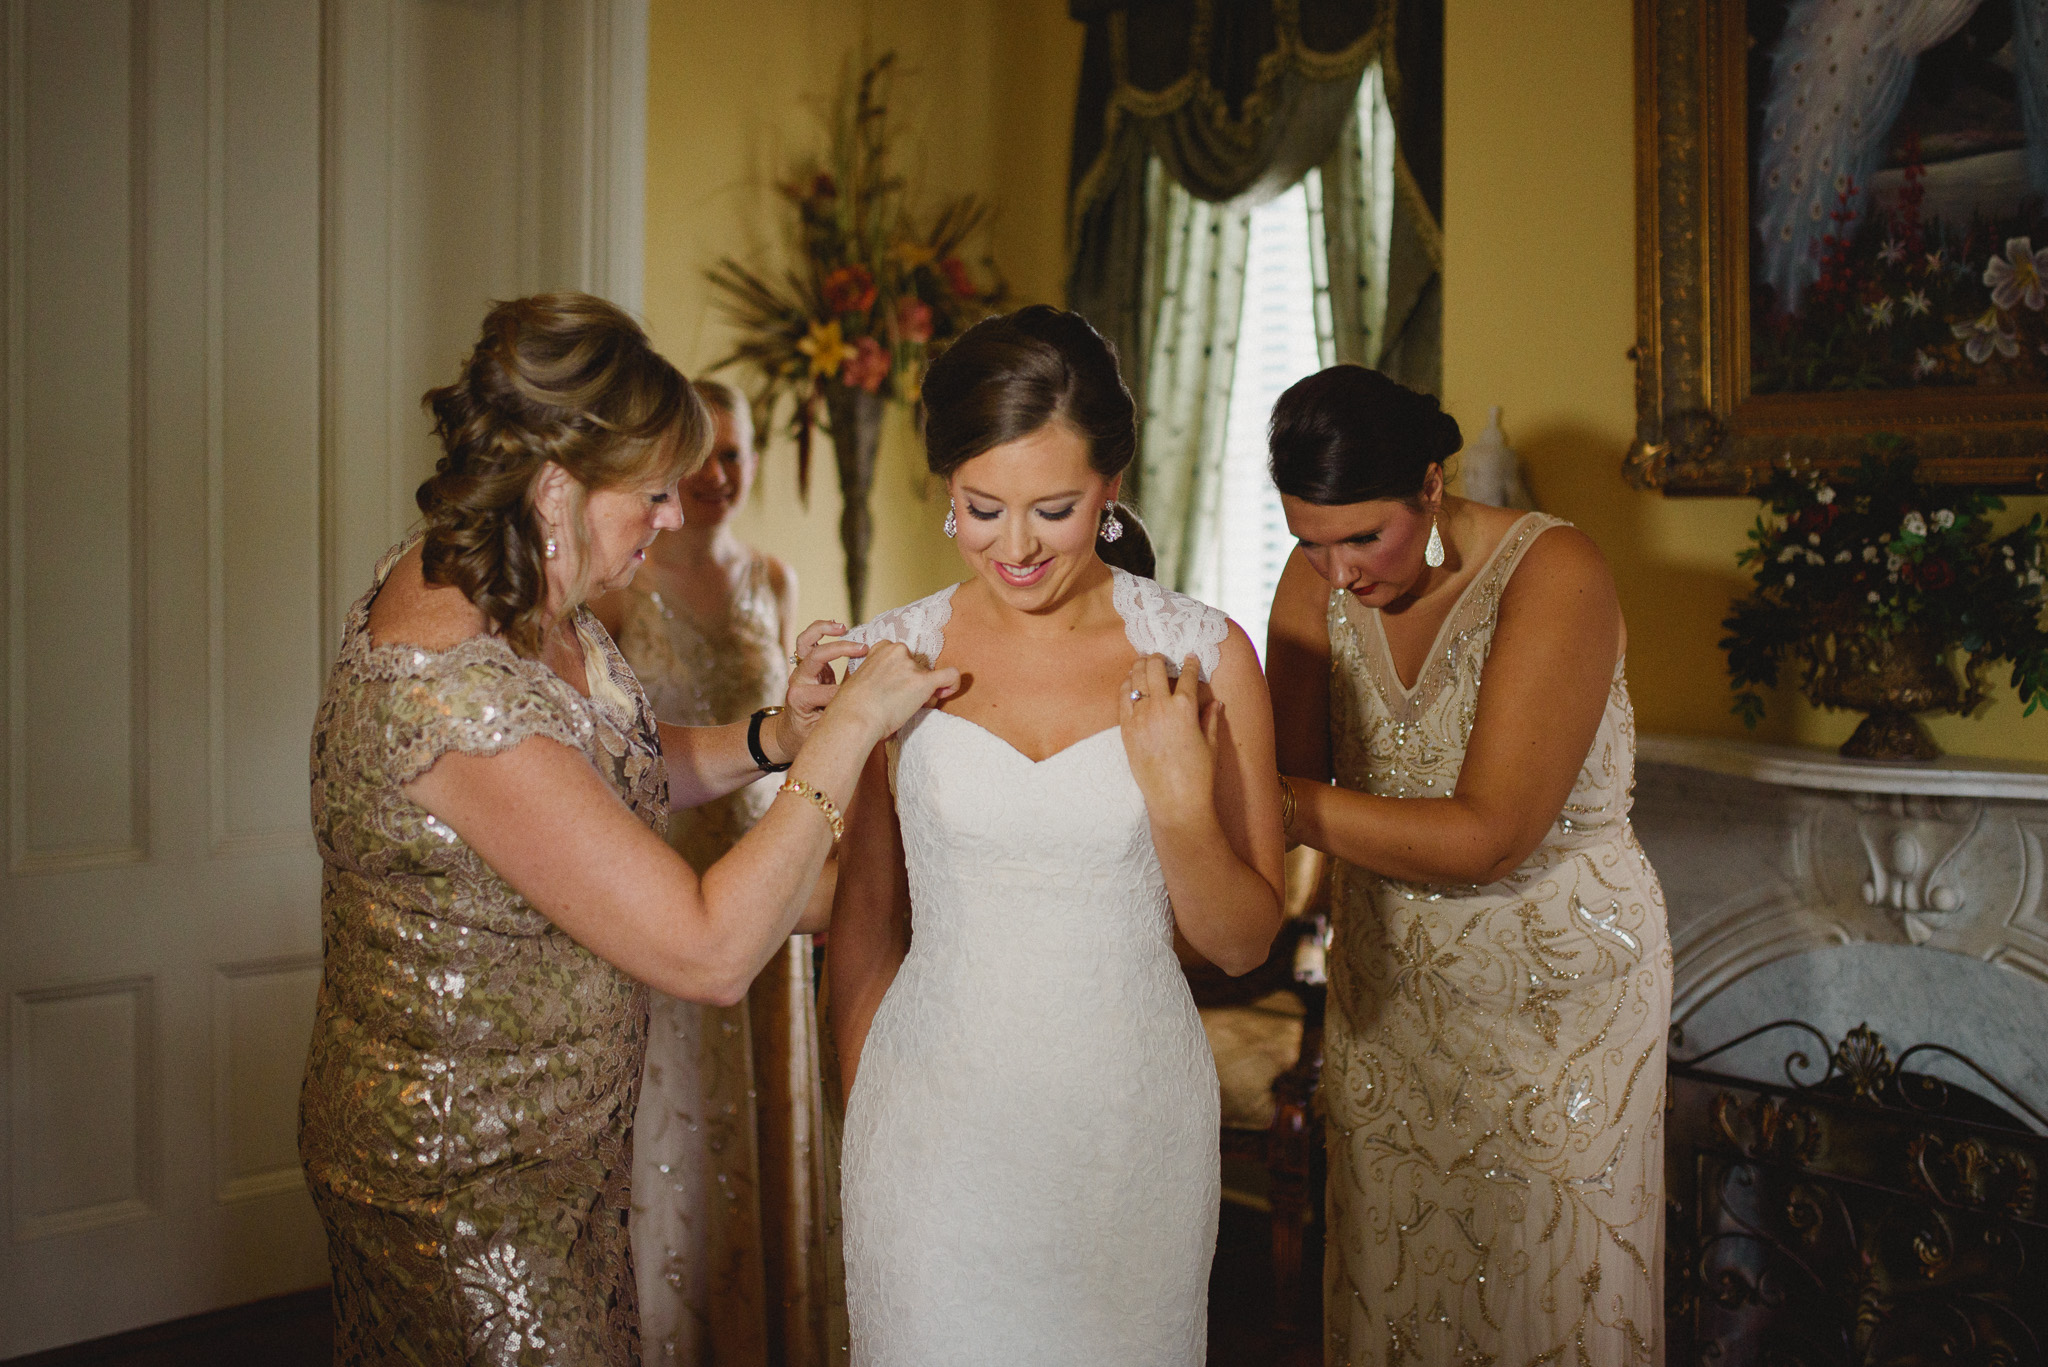 Savannah Photography - Bride getting dresses